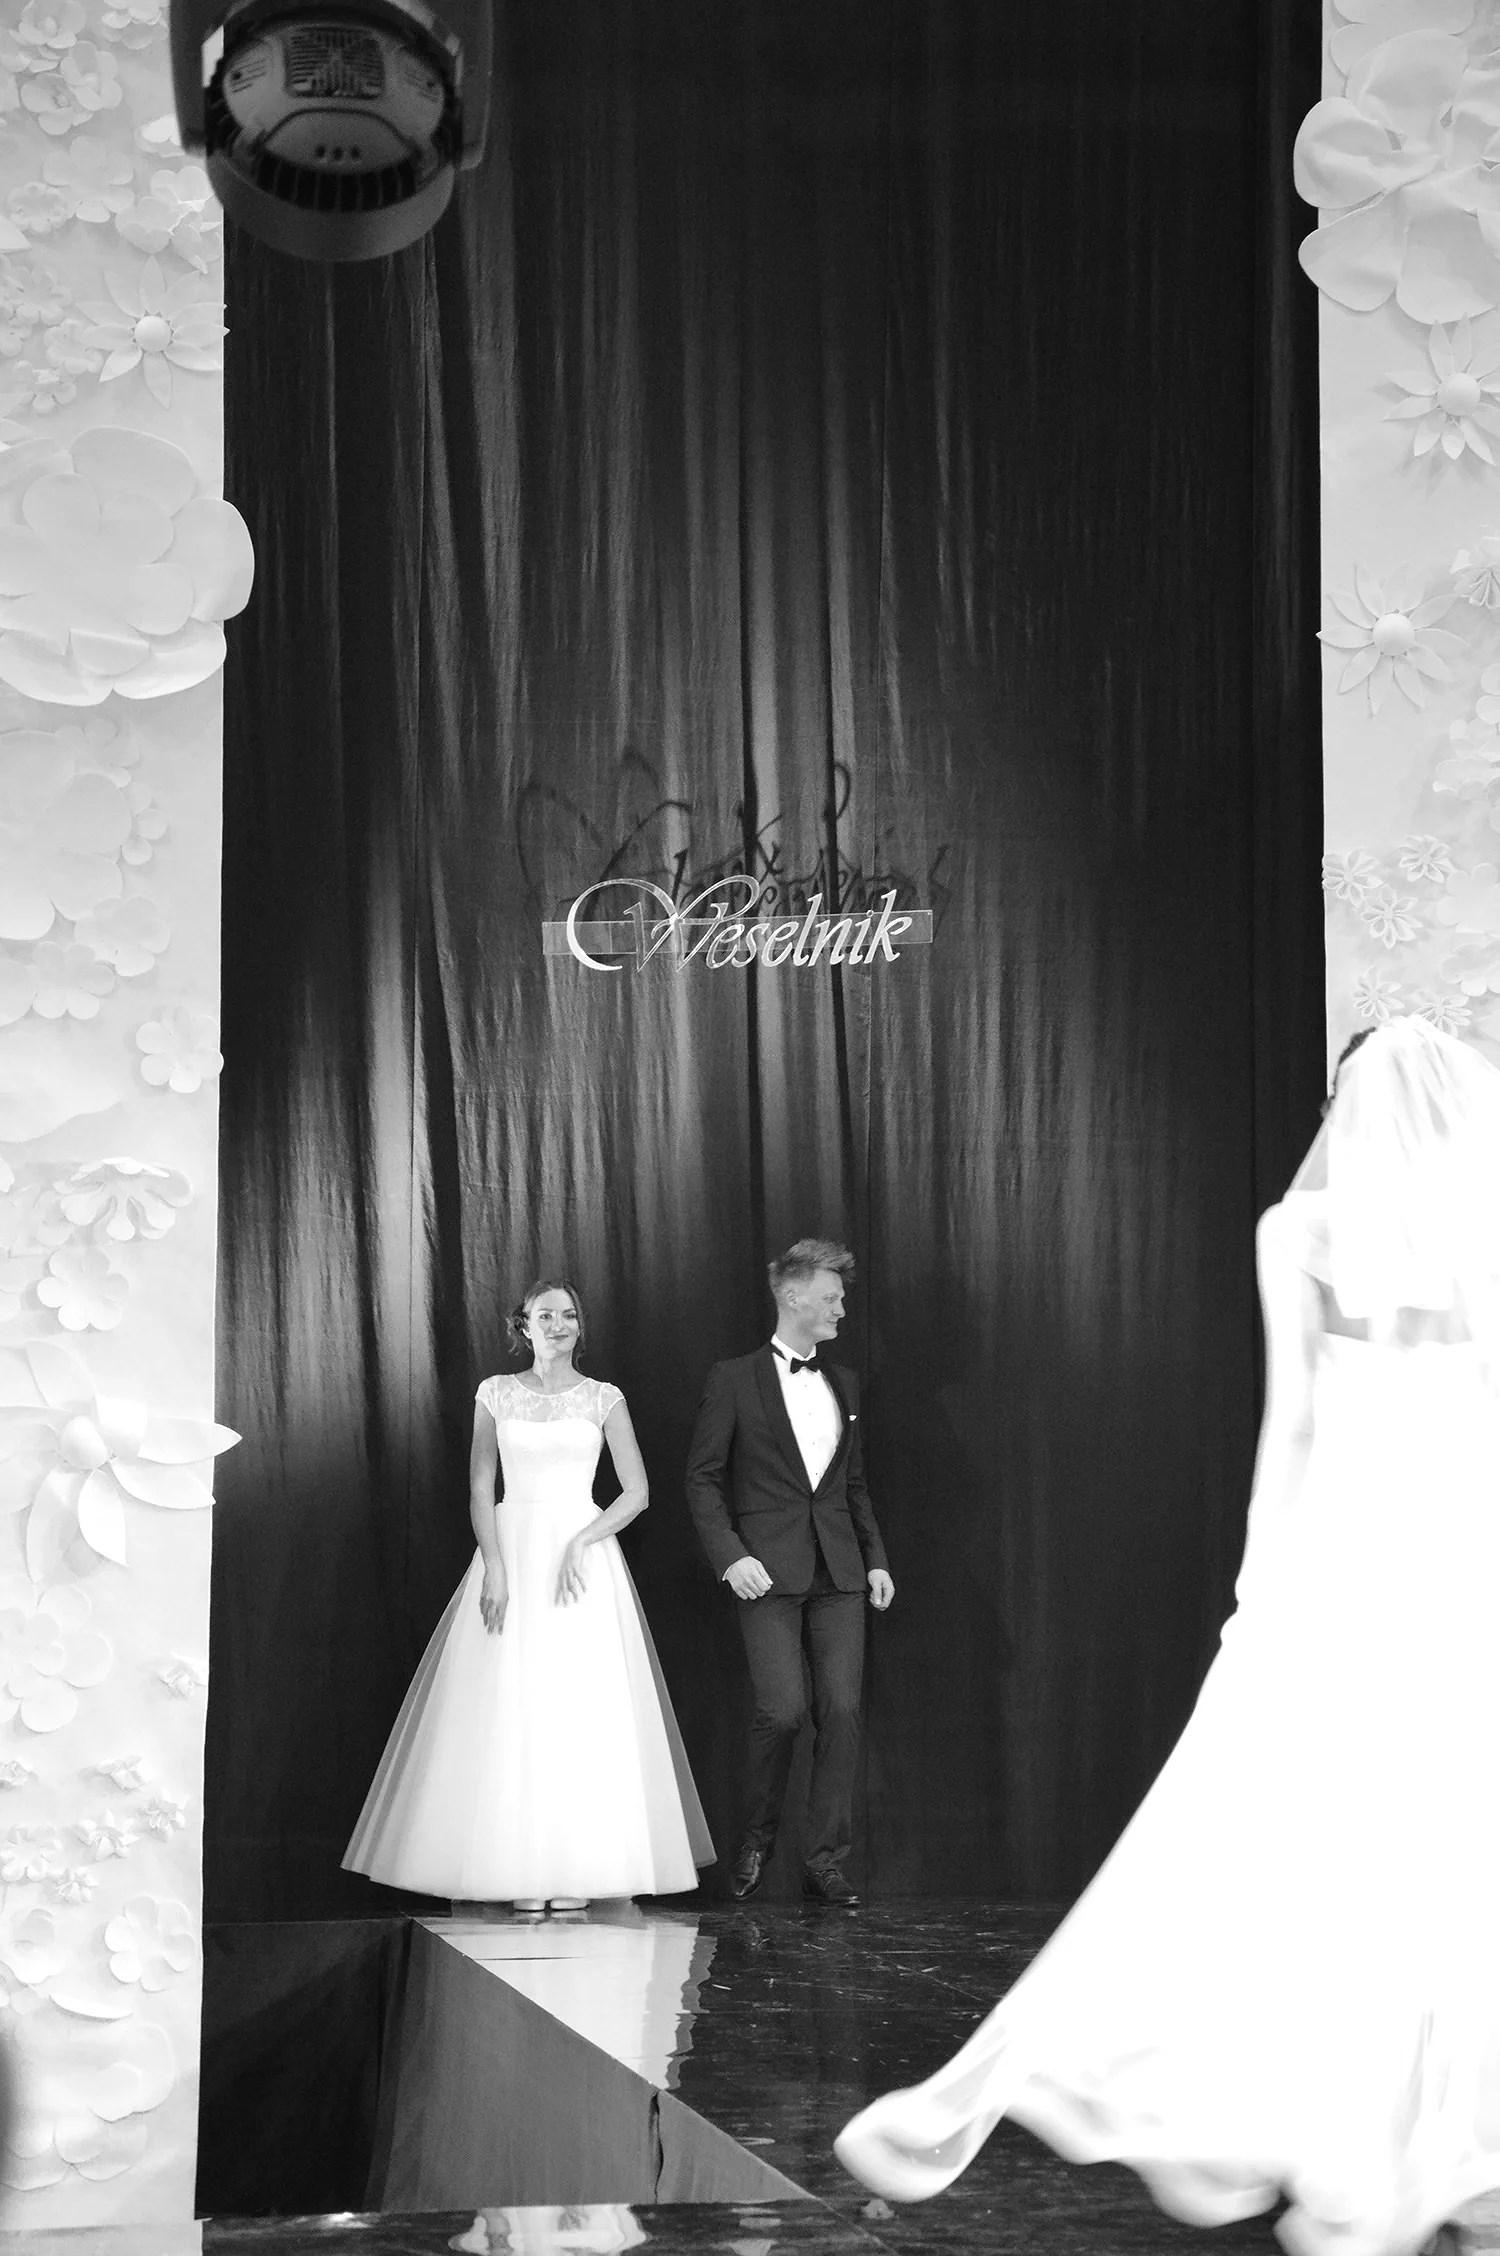 weselnik, wedding